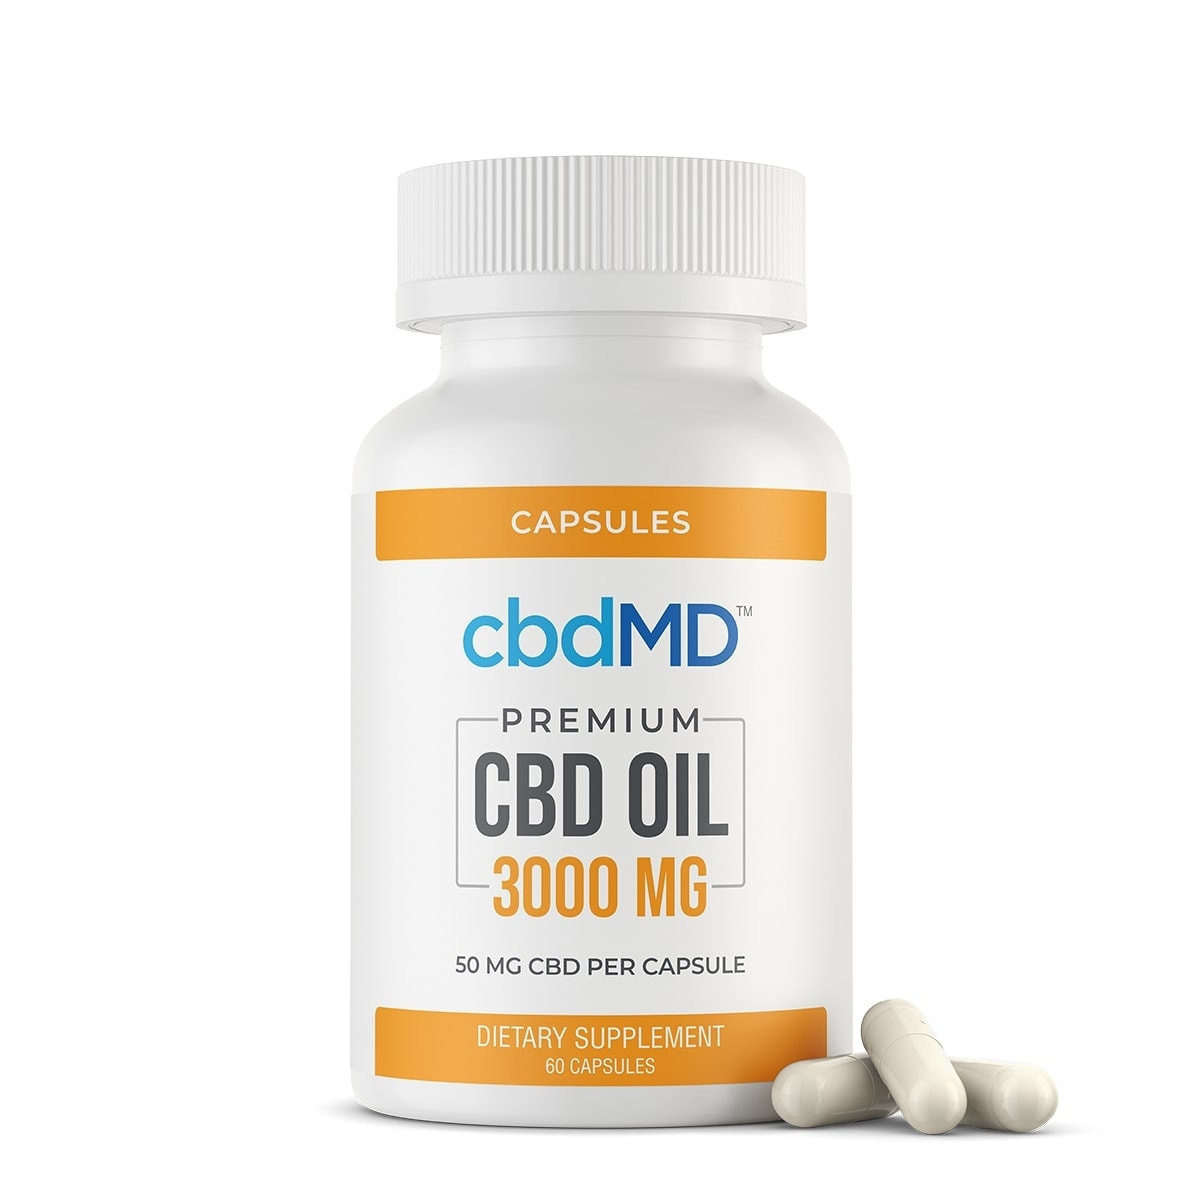 cbdMD, CBD Oil Capsules, Broad Spectrum THC-Free, 60-Count, 3000mg of CBD 1